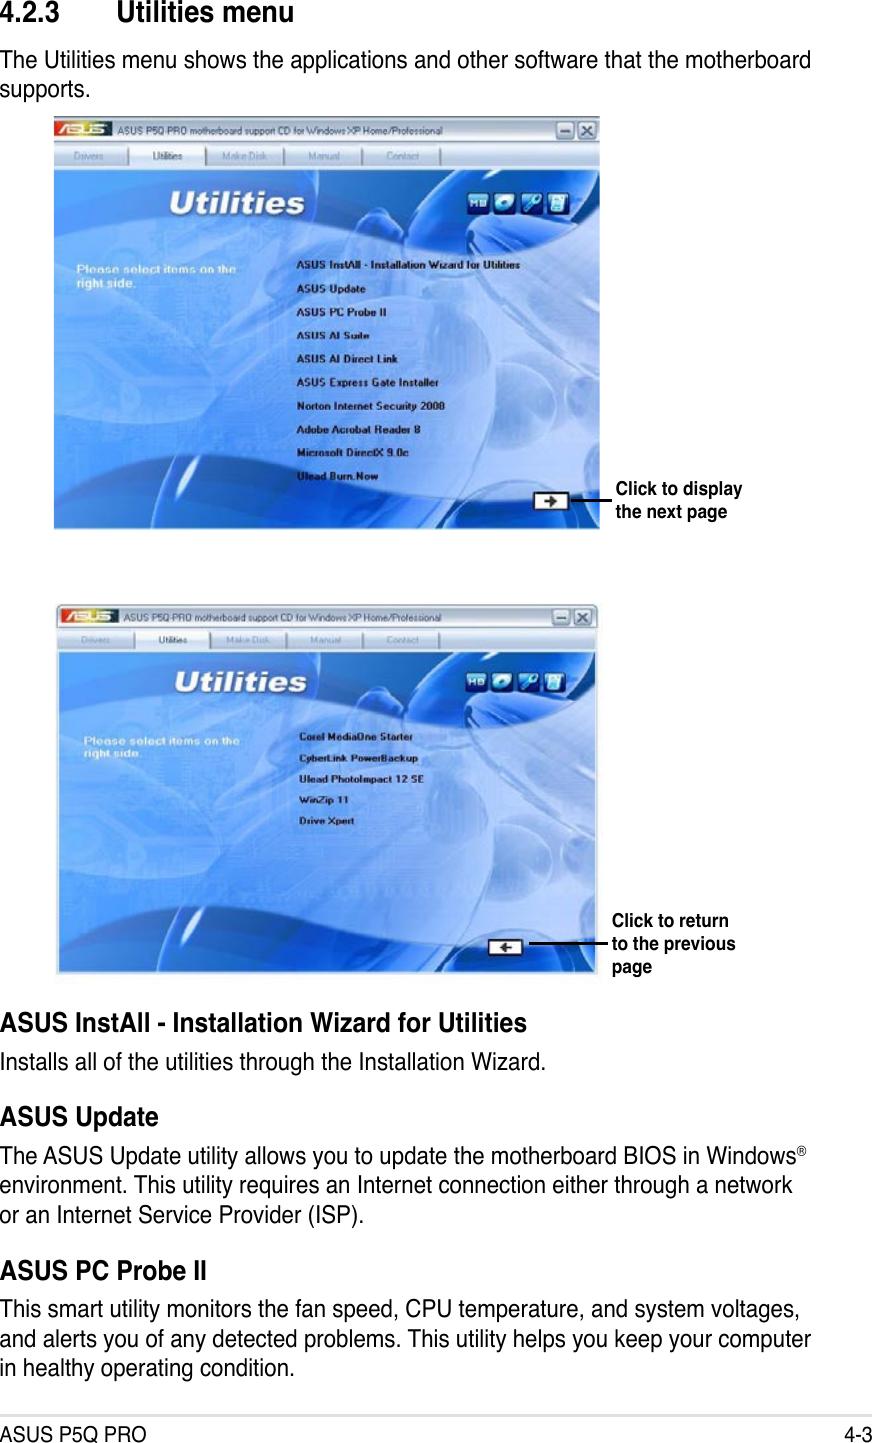 Asus P5Q Pro Motherboard Atx Users Manual ManualsLib Makes